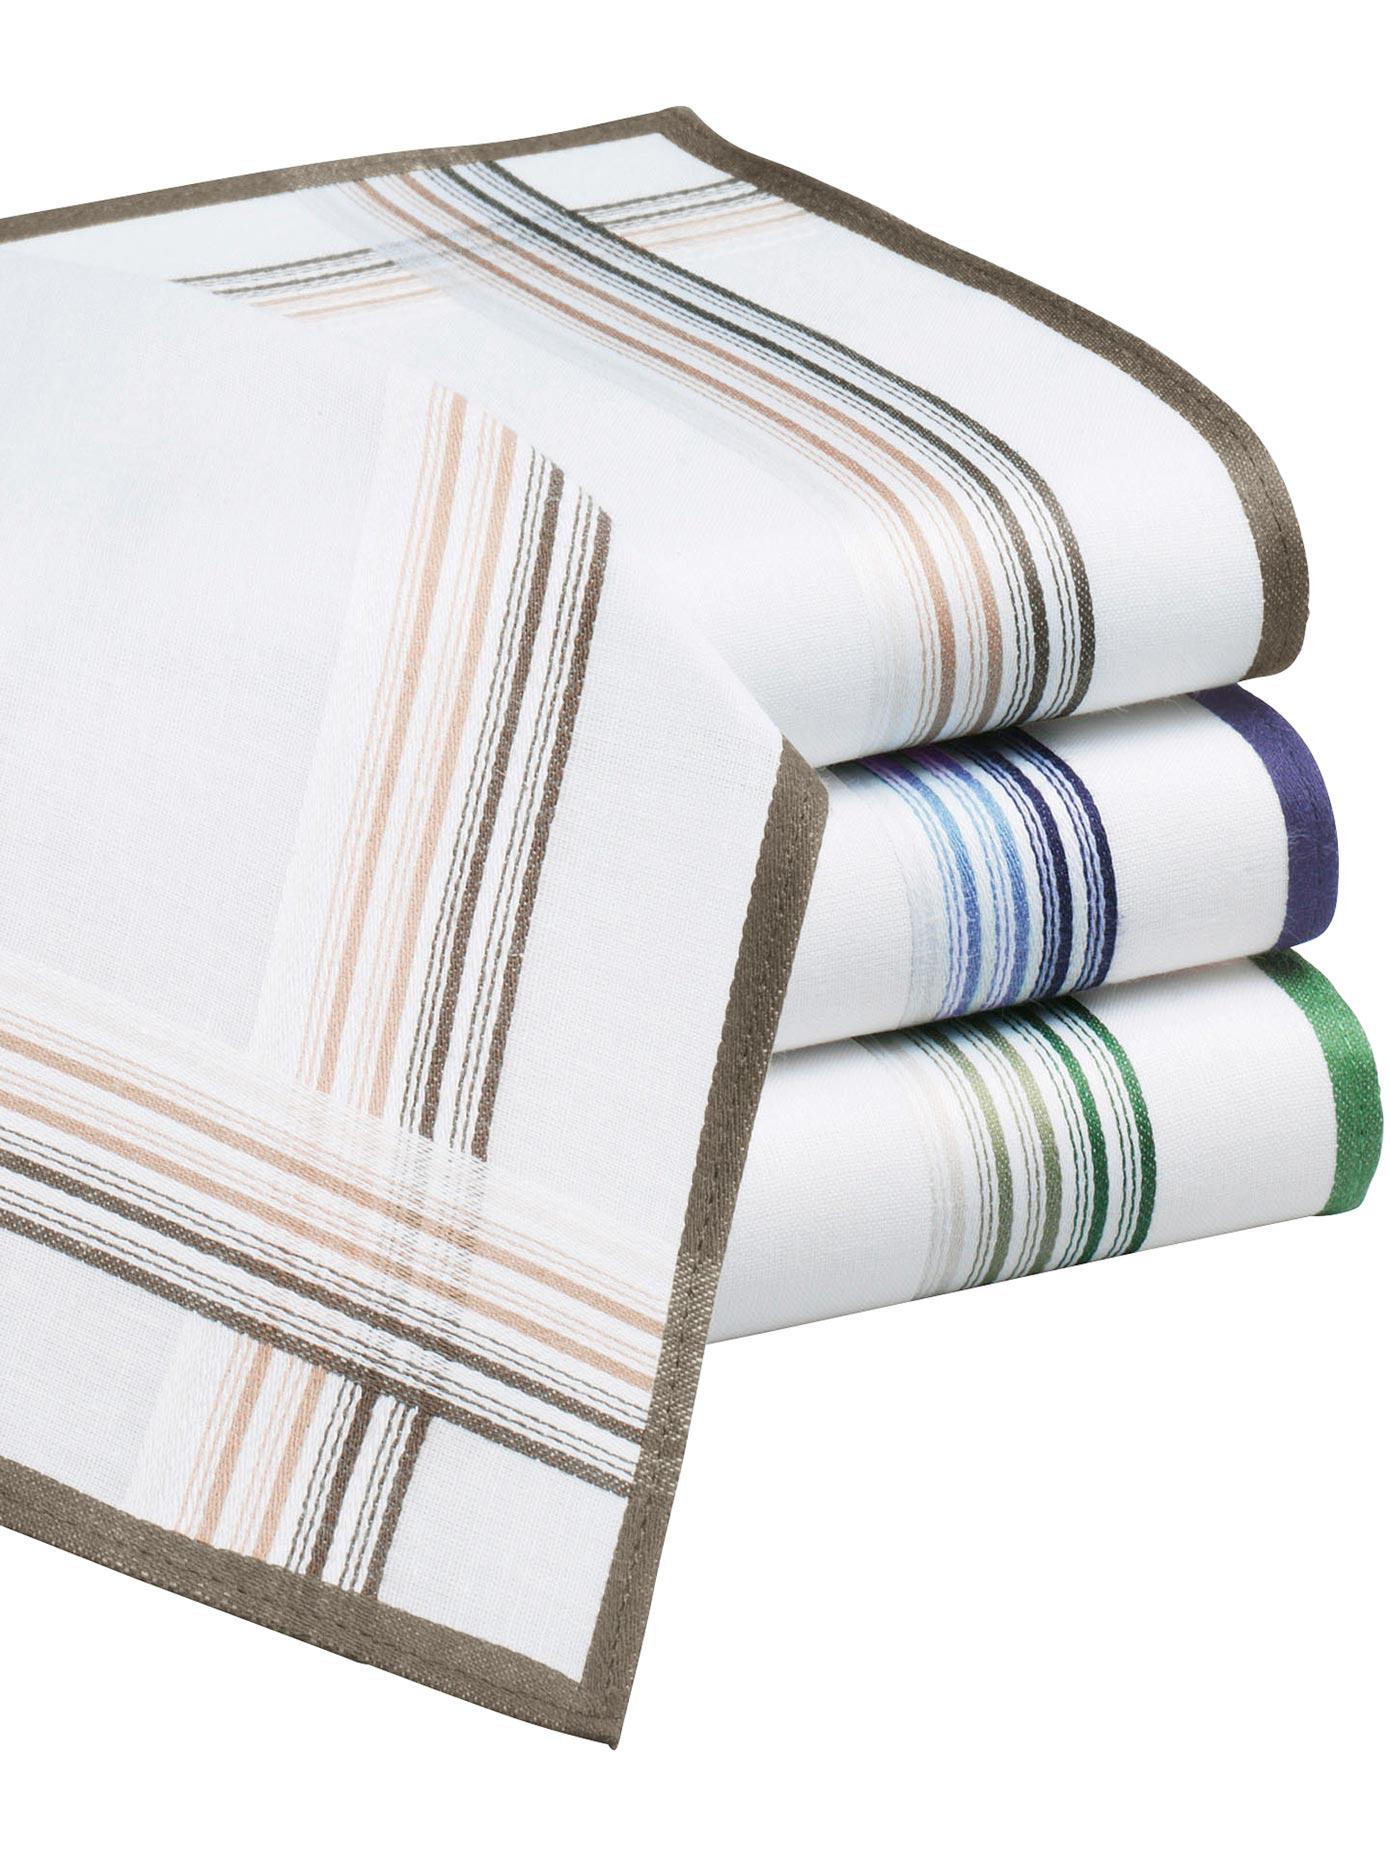 Stuchlik Herren-Taschentuch | Accessoires > Schals & Tücher > Tücher | Stuchlik